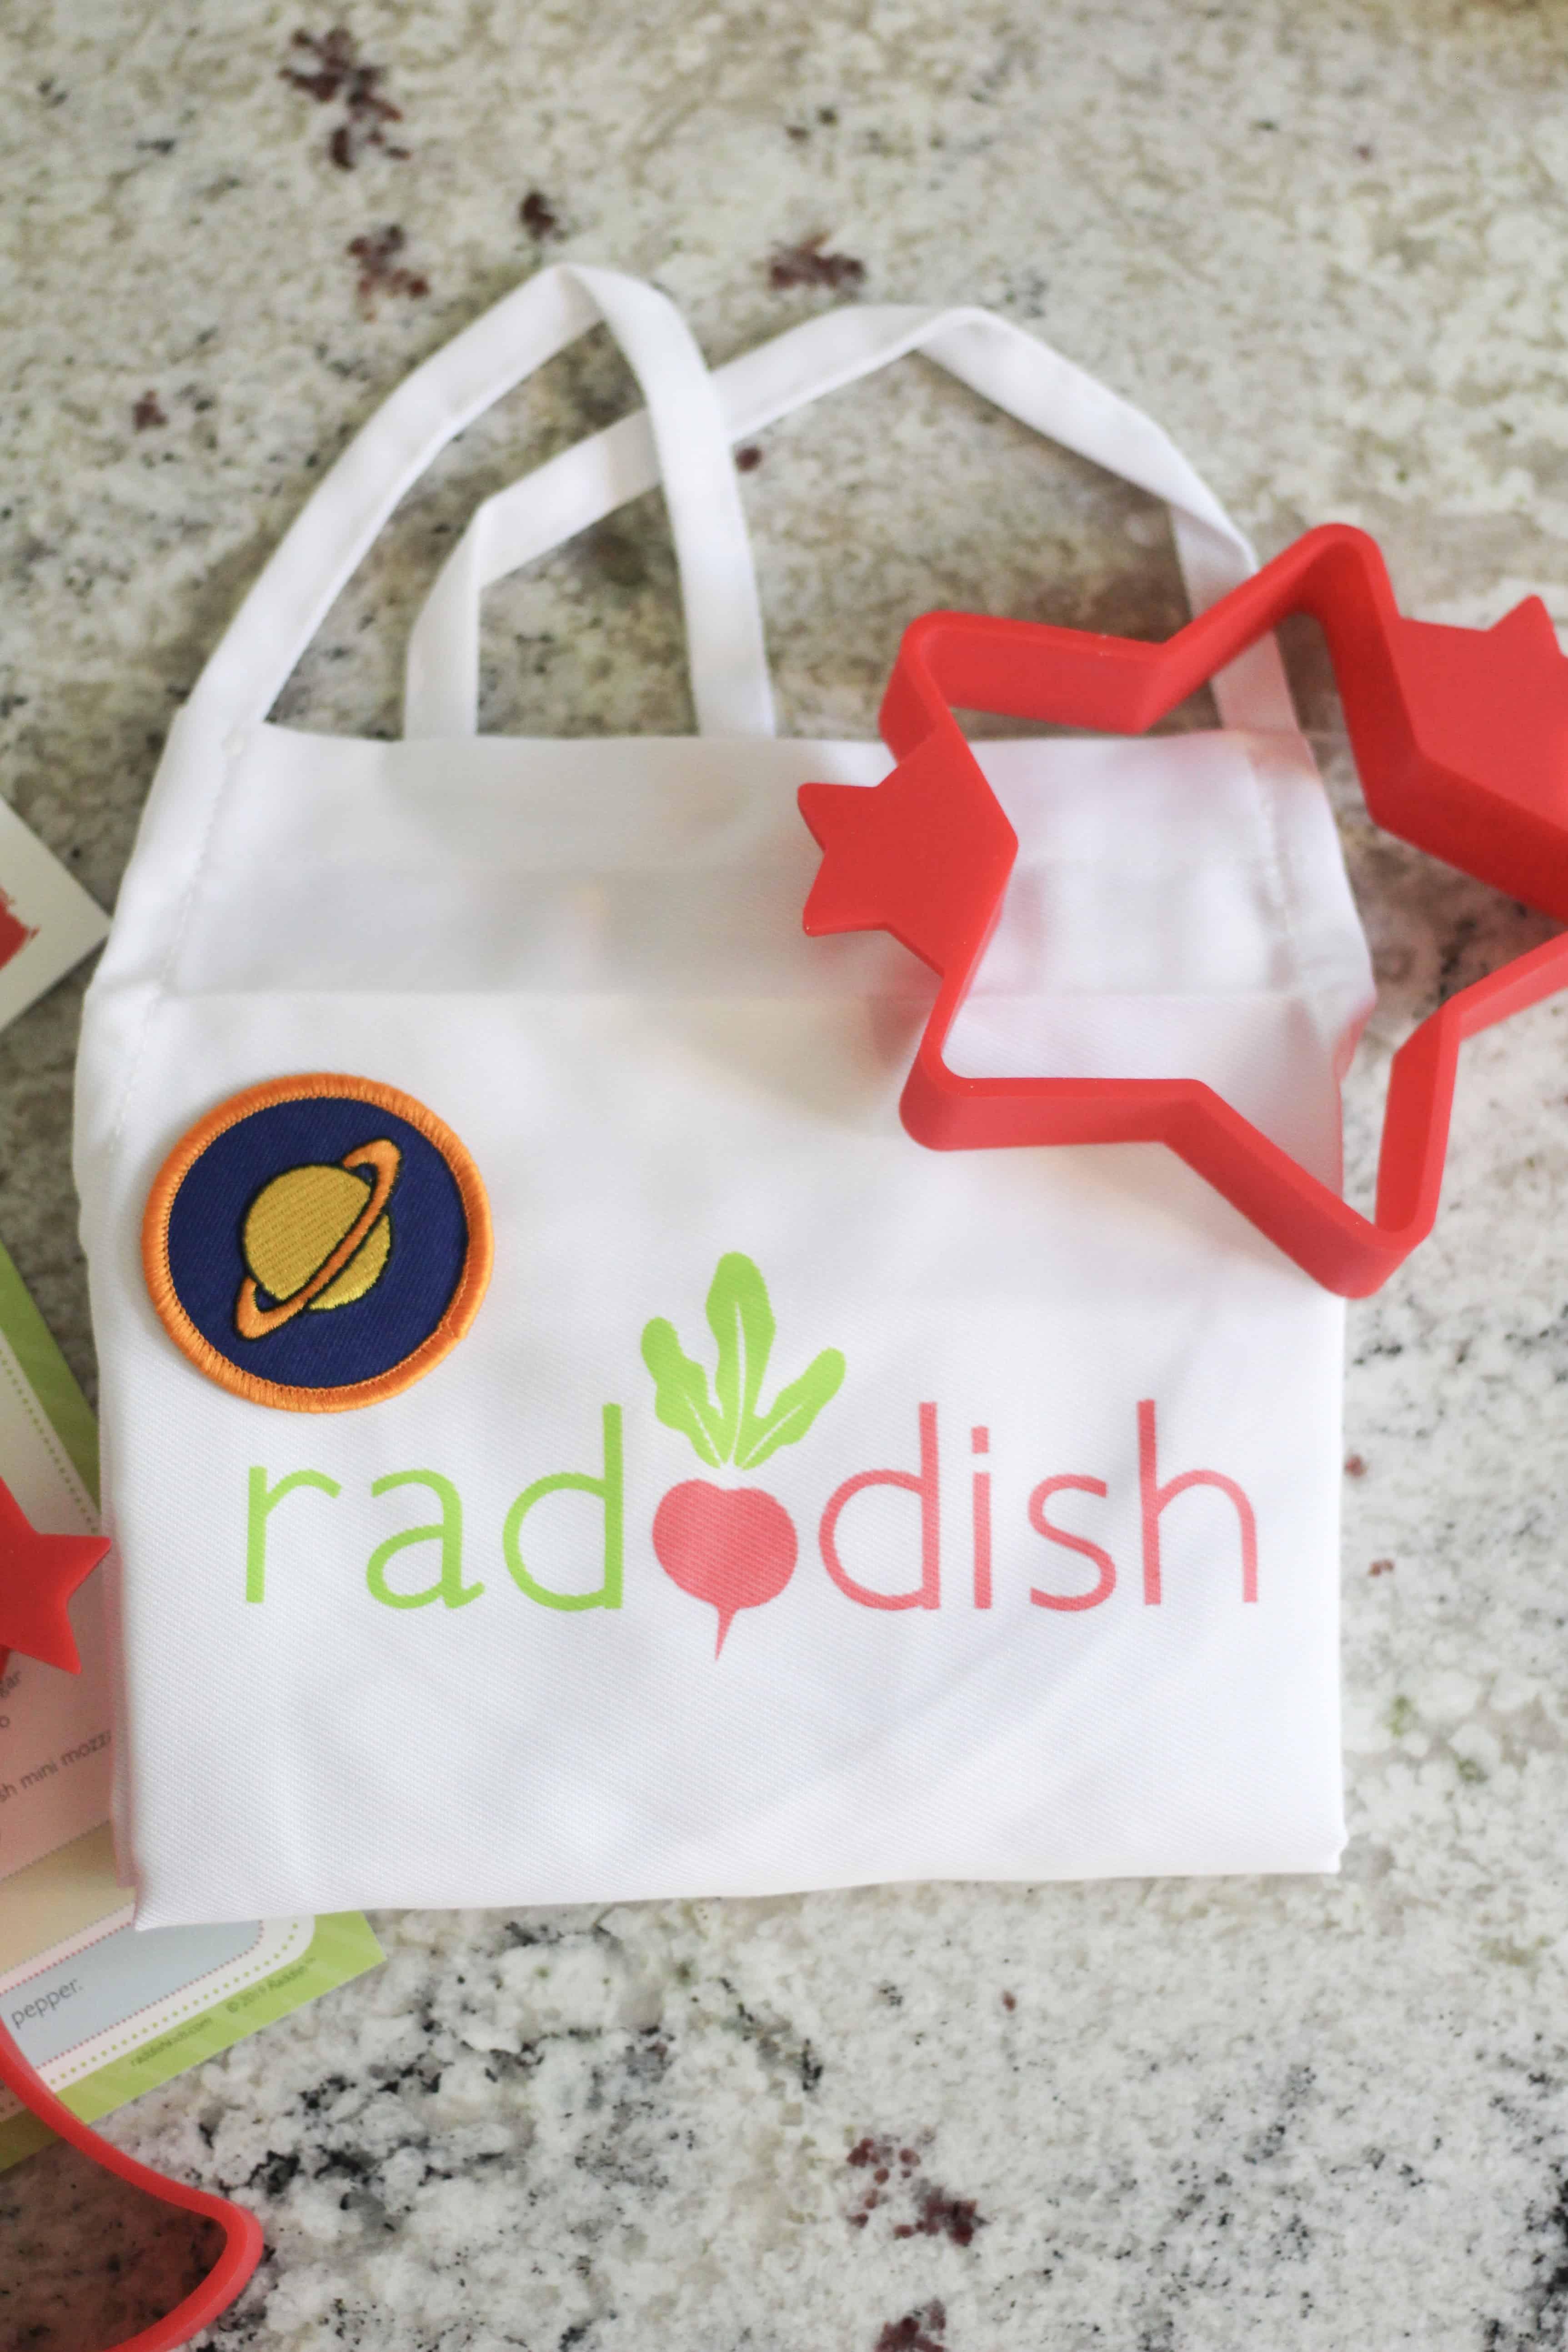 Raddish Kids apron